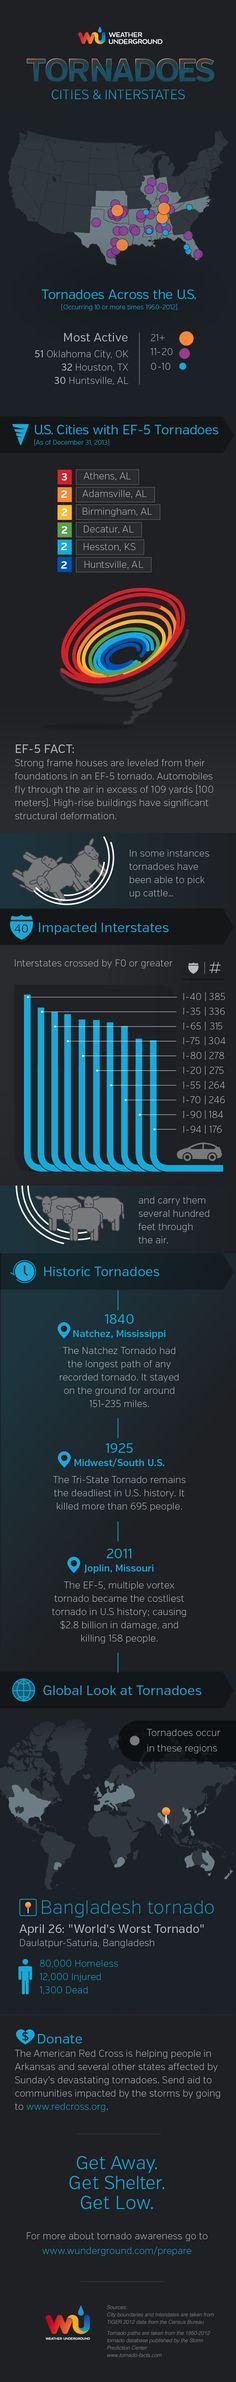 Tornado info graphic